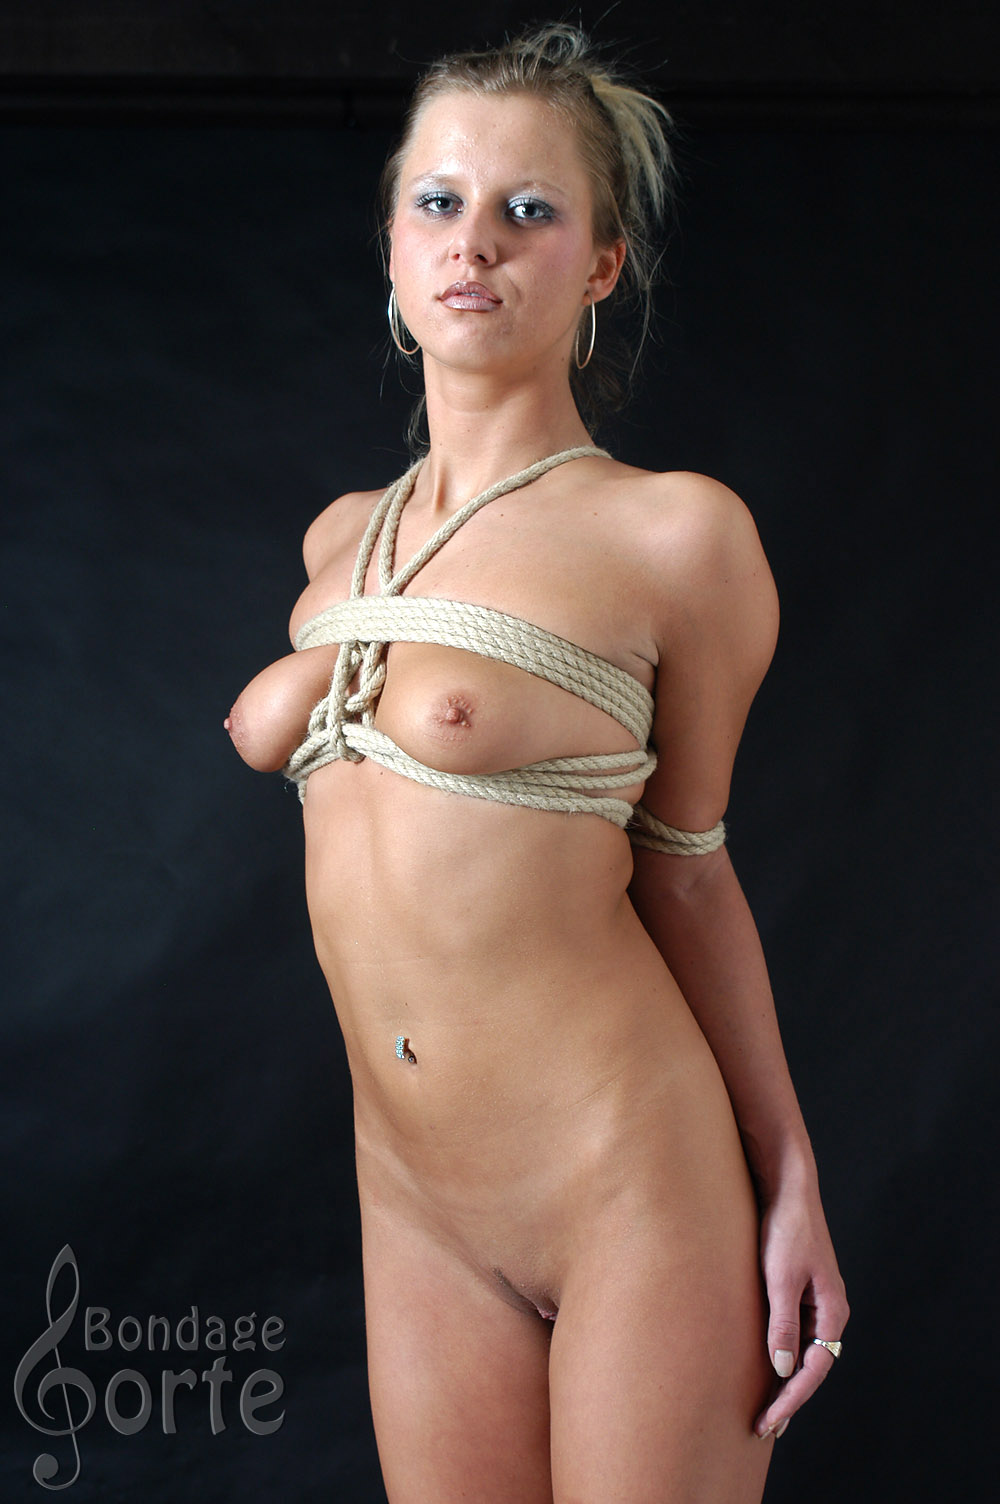 Forte porn bondage Bondage forte